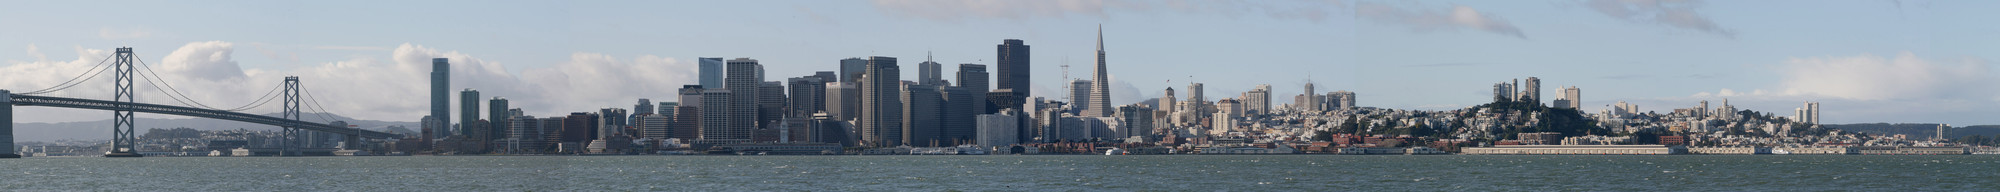 Skyline de San Francisco en 2009. Image © Leonard G. Vía Wikipedia CC